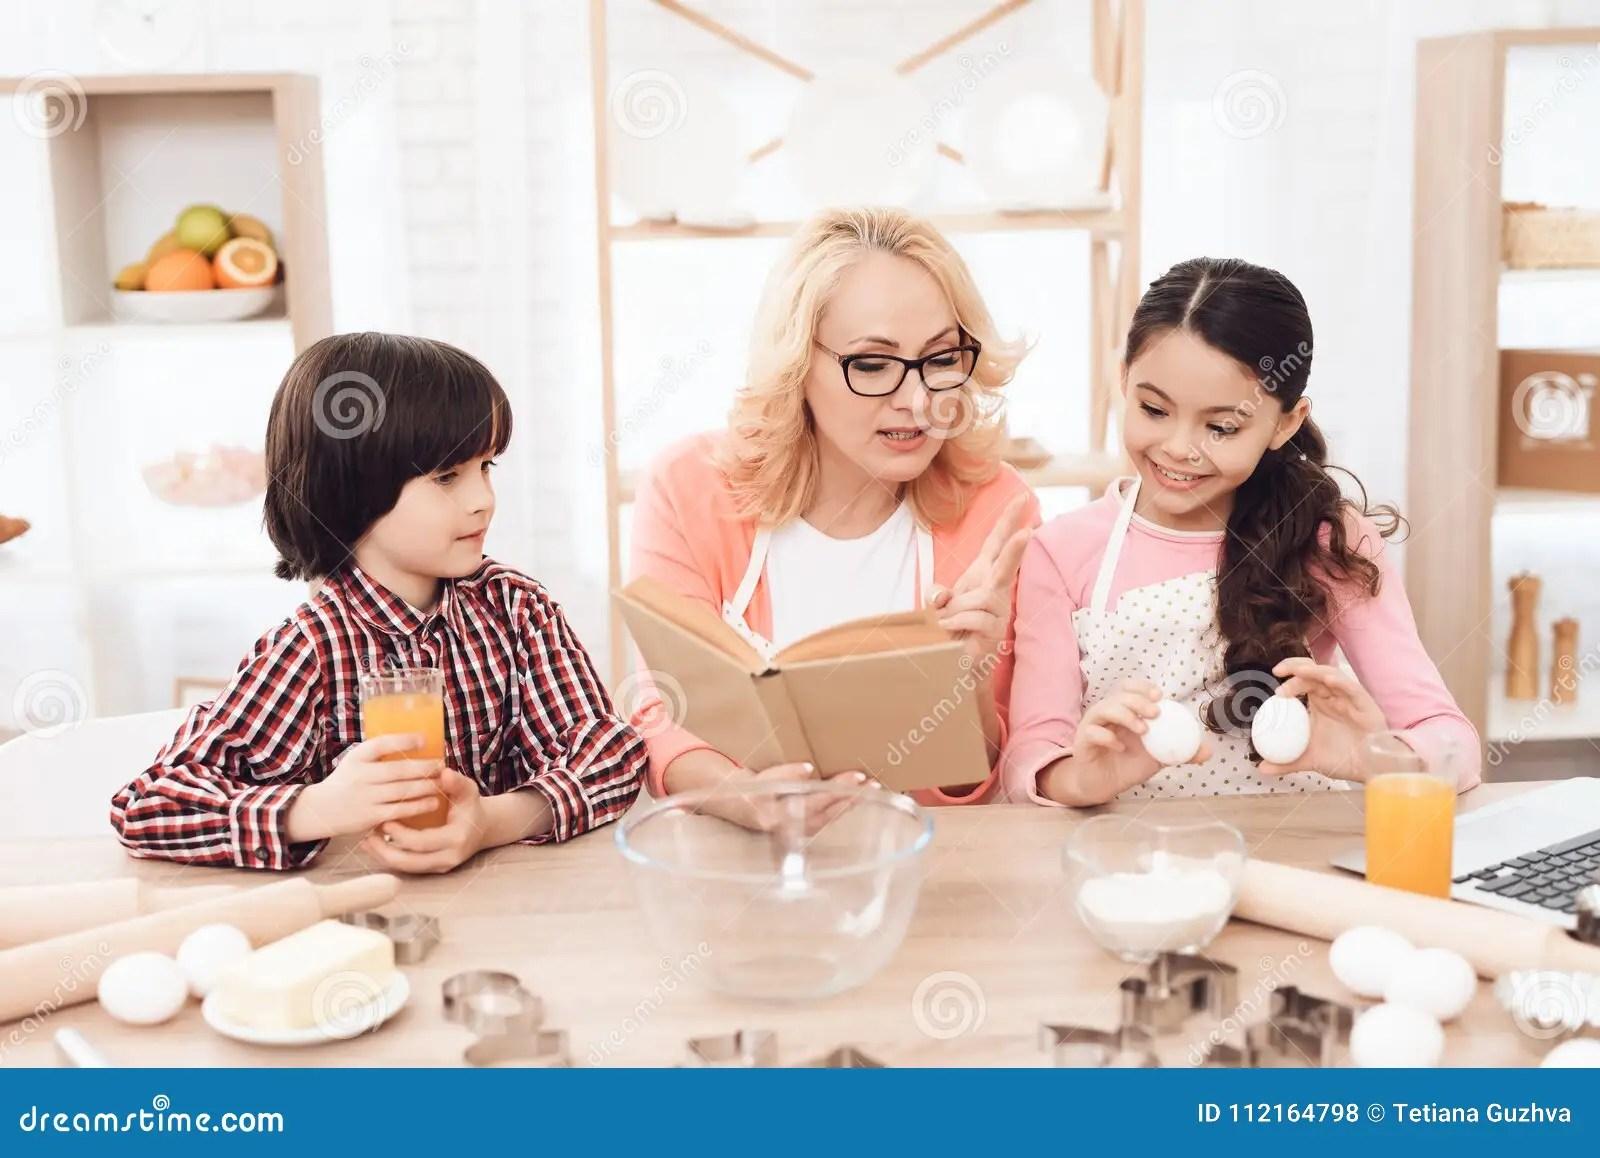 kitchen apron for kids non slip rugs 围裙的美丽的祖母 与她的孙一起 看菜谱在厨房里库存照片 图片包括有 围裙的成人祖母 看菜谱在厨房里烘烤曲奇饼有她的孙的美丽的祖母在厨房里烘烤曲奇饼